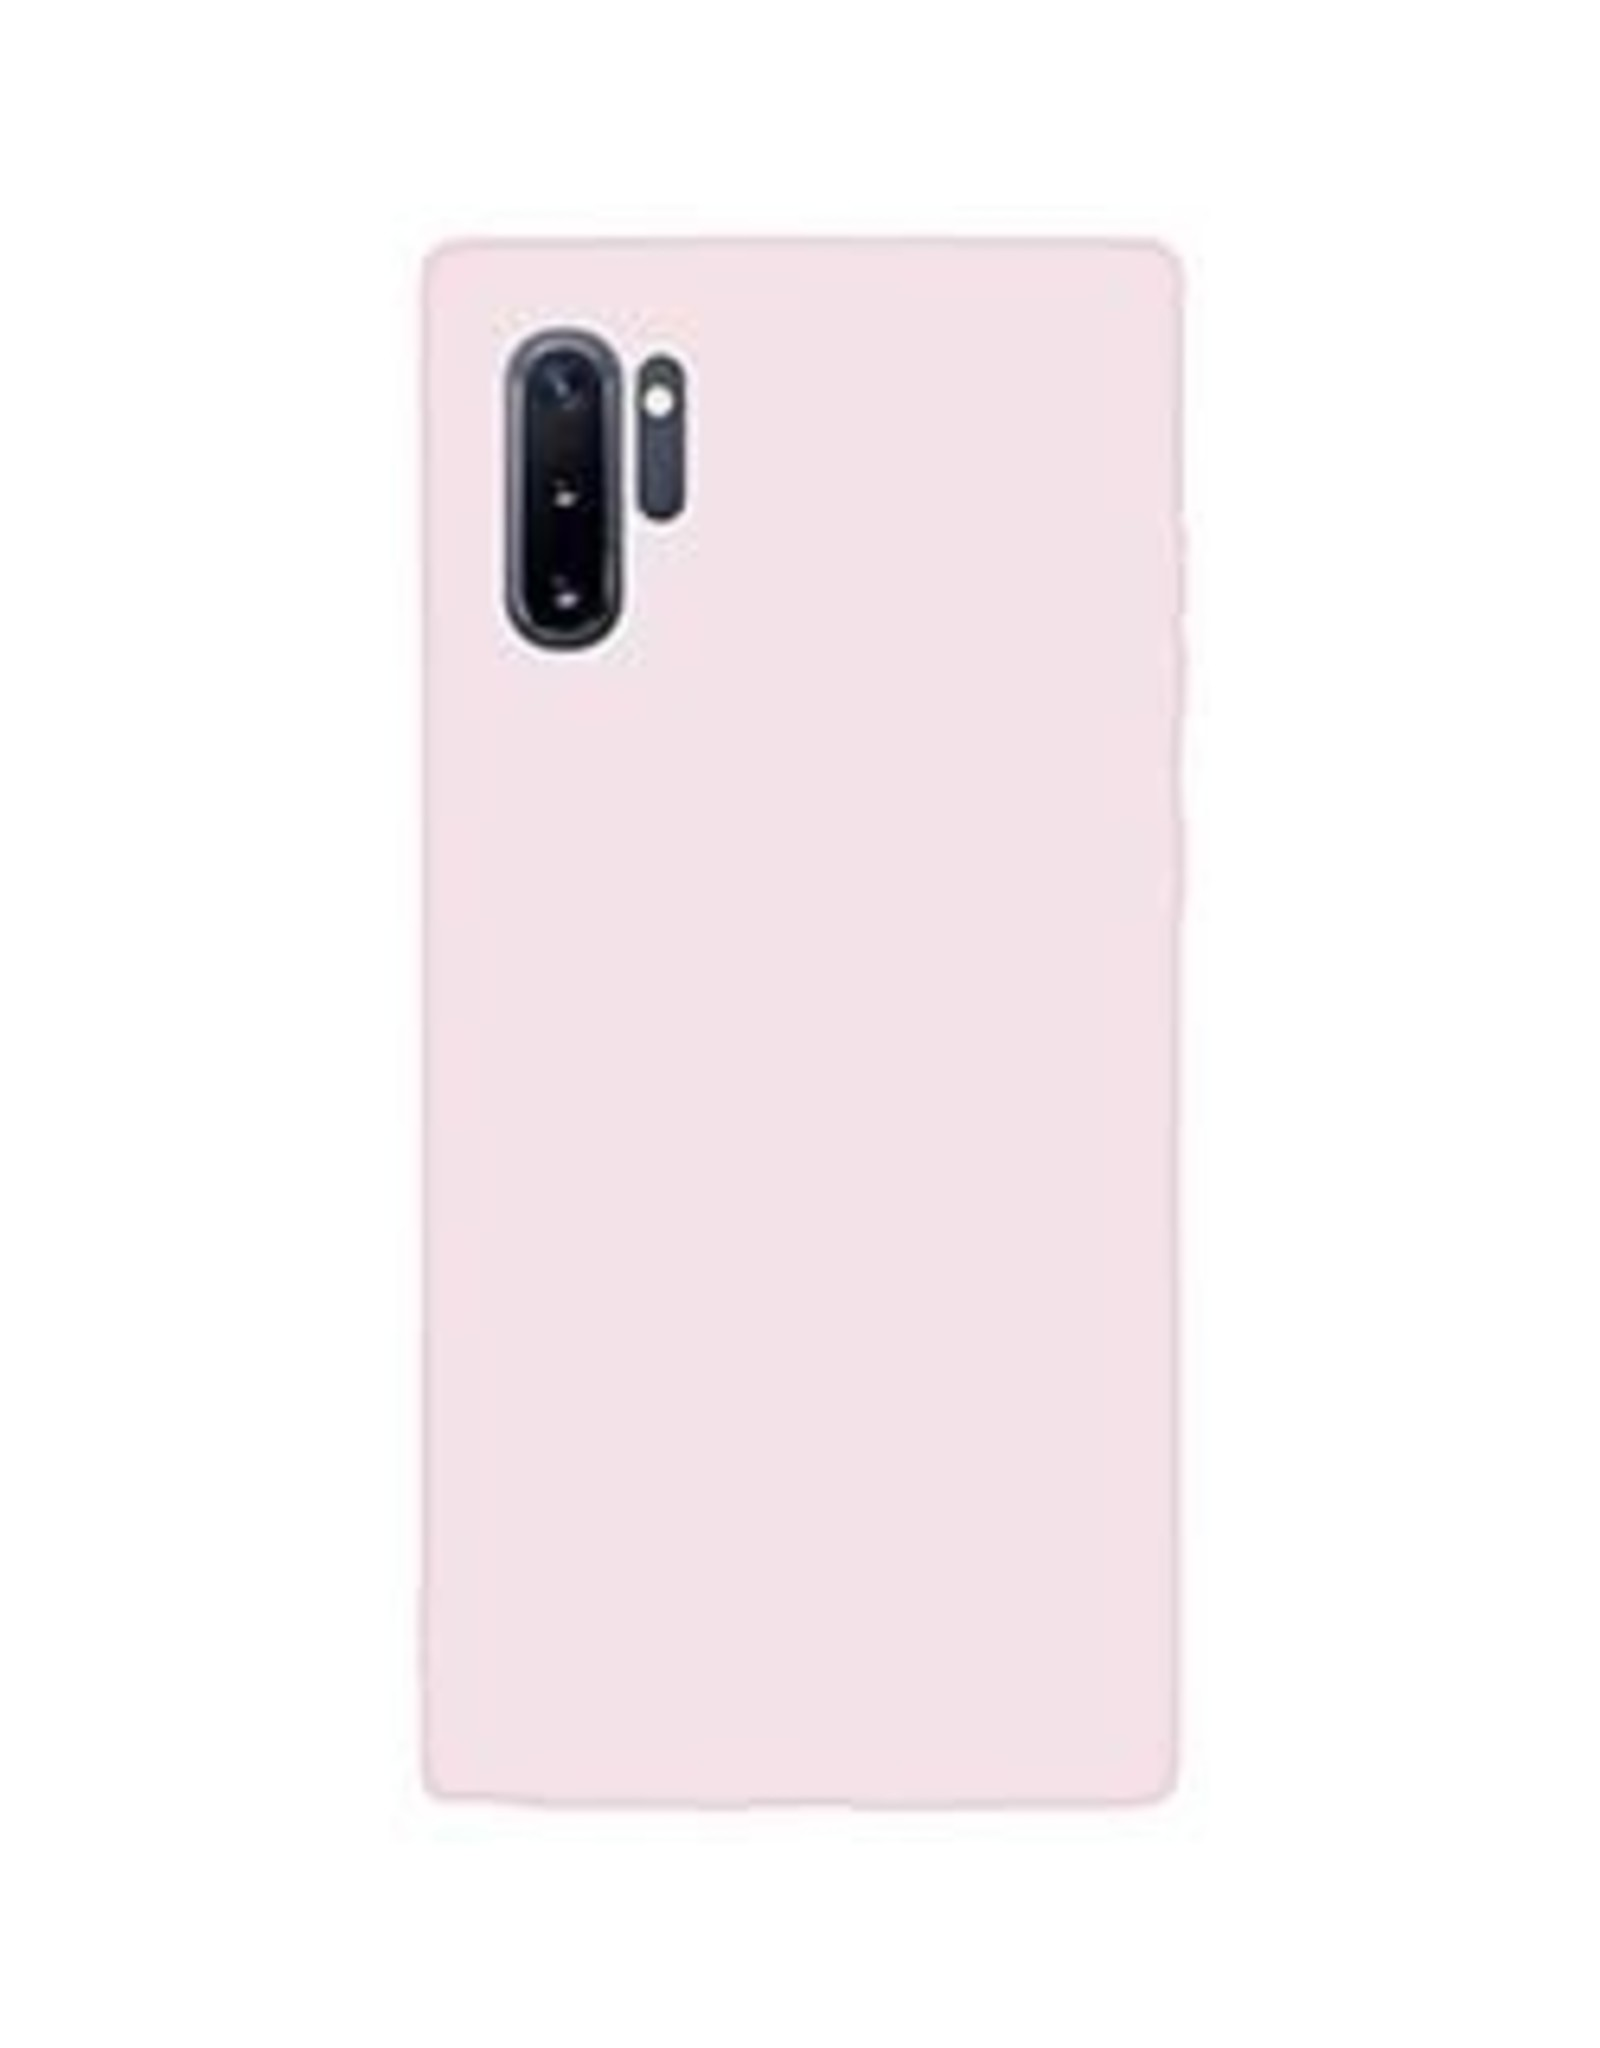 Uunique London | Samsung Galaxy Note 10+  Pink (Candy Pink) Liquid Silicone Case 15-04913